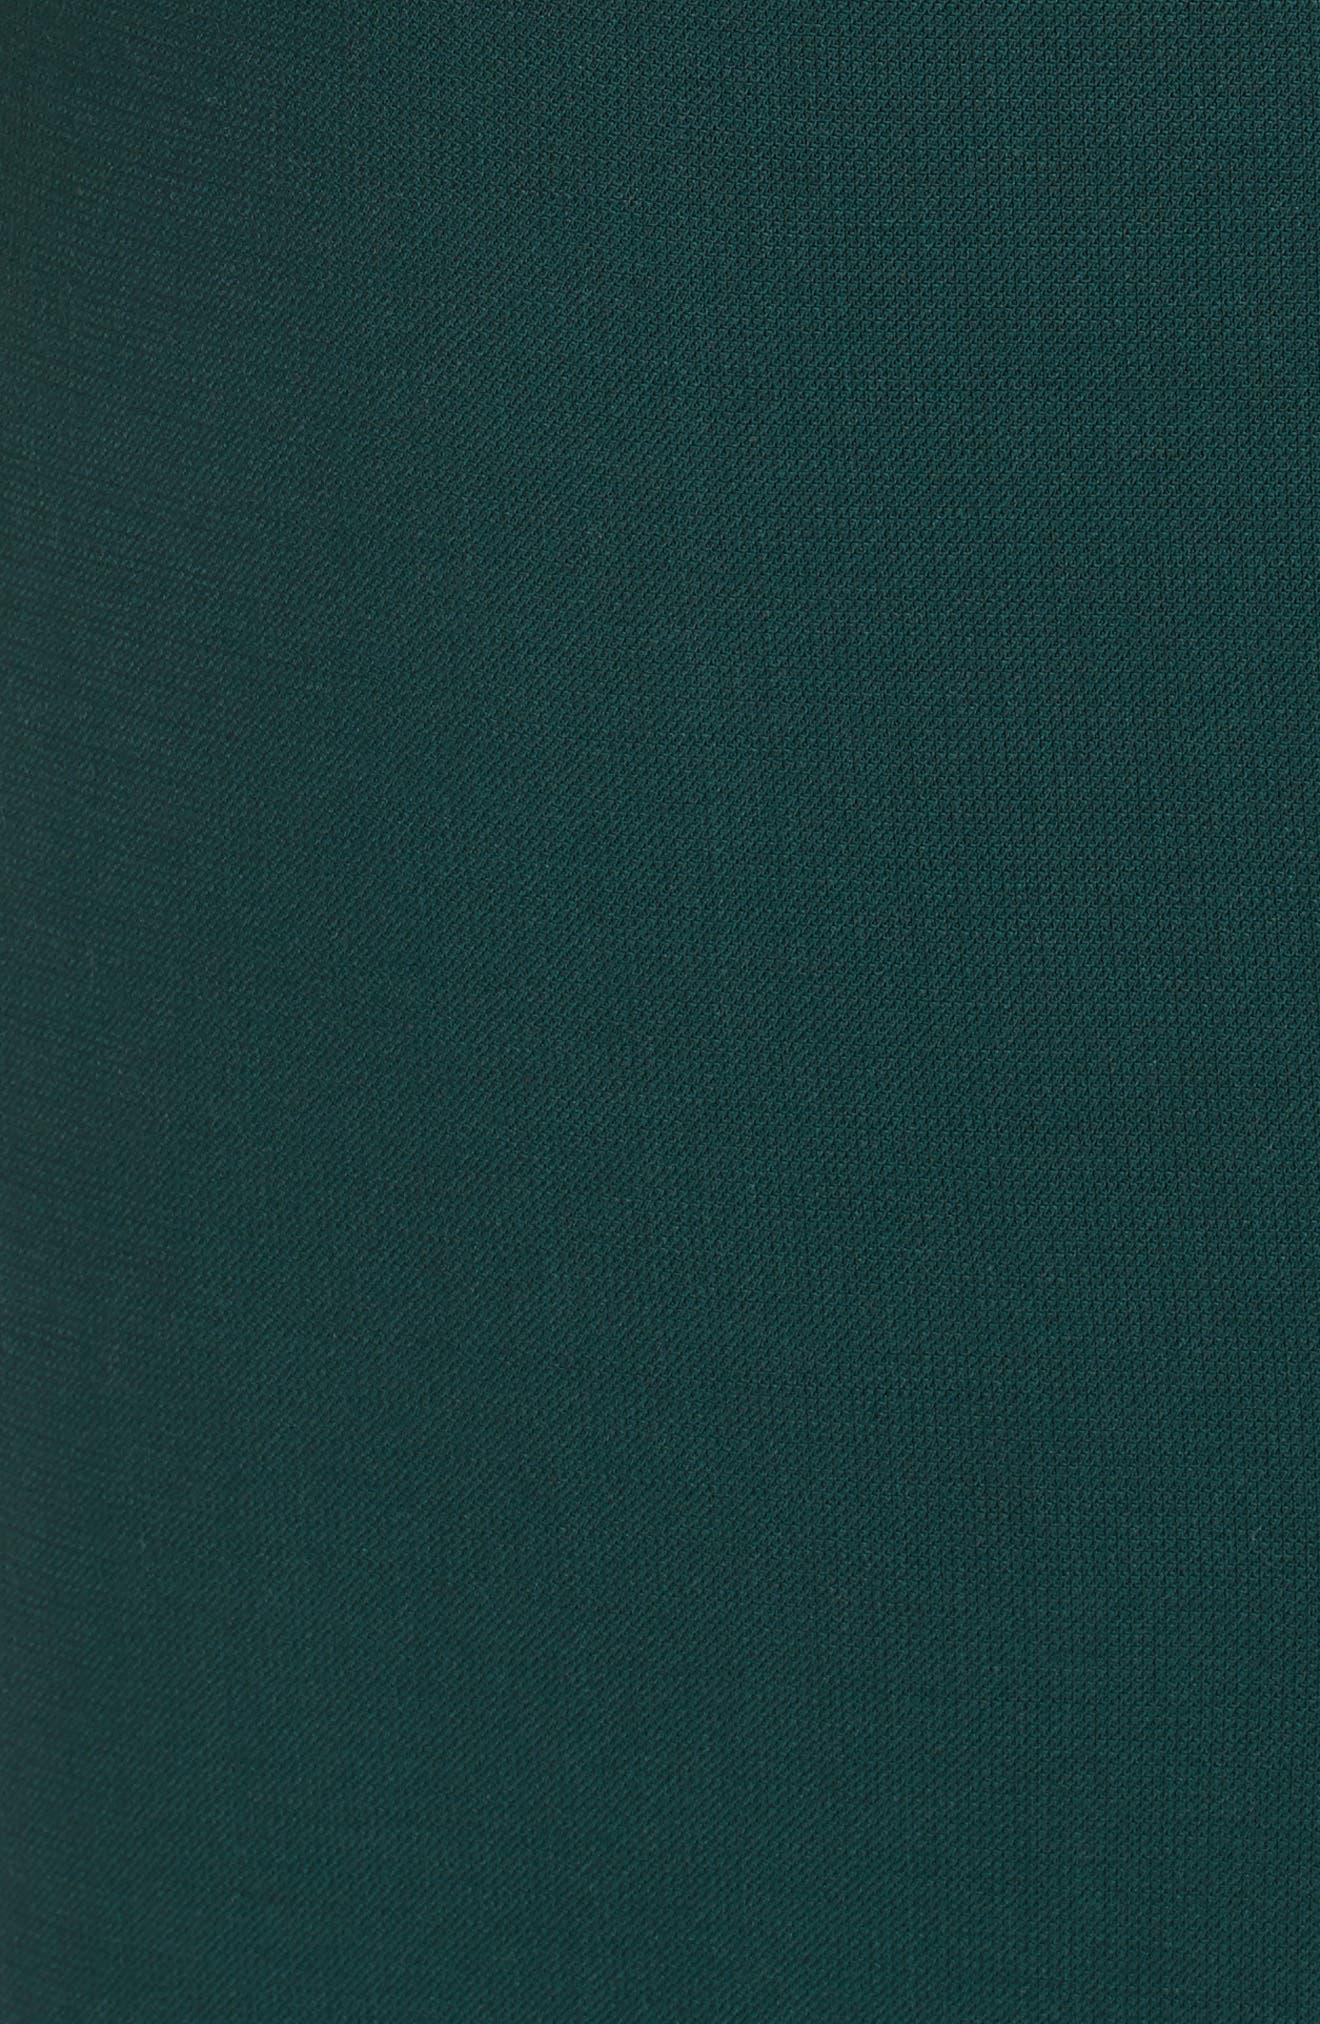 Vanufa Stretch Wool Suit Skirt,                             Alternate thumbnail 5, color,                             PINE GREEN